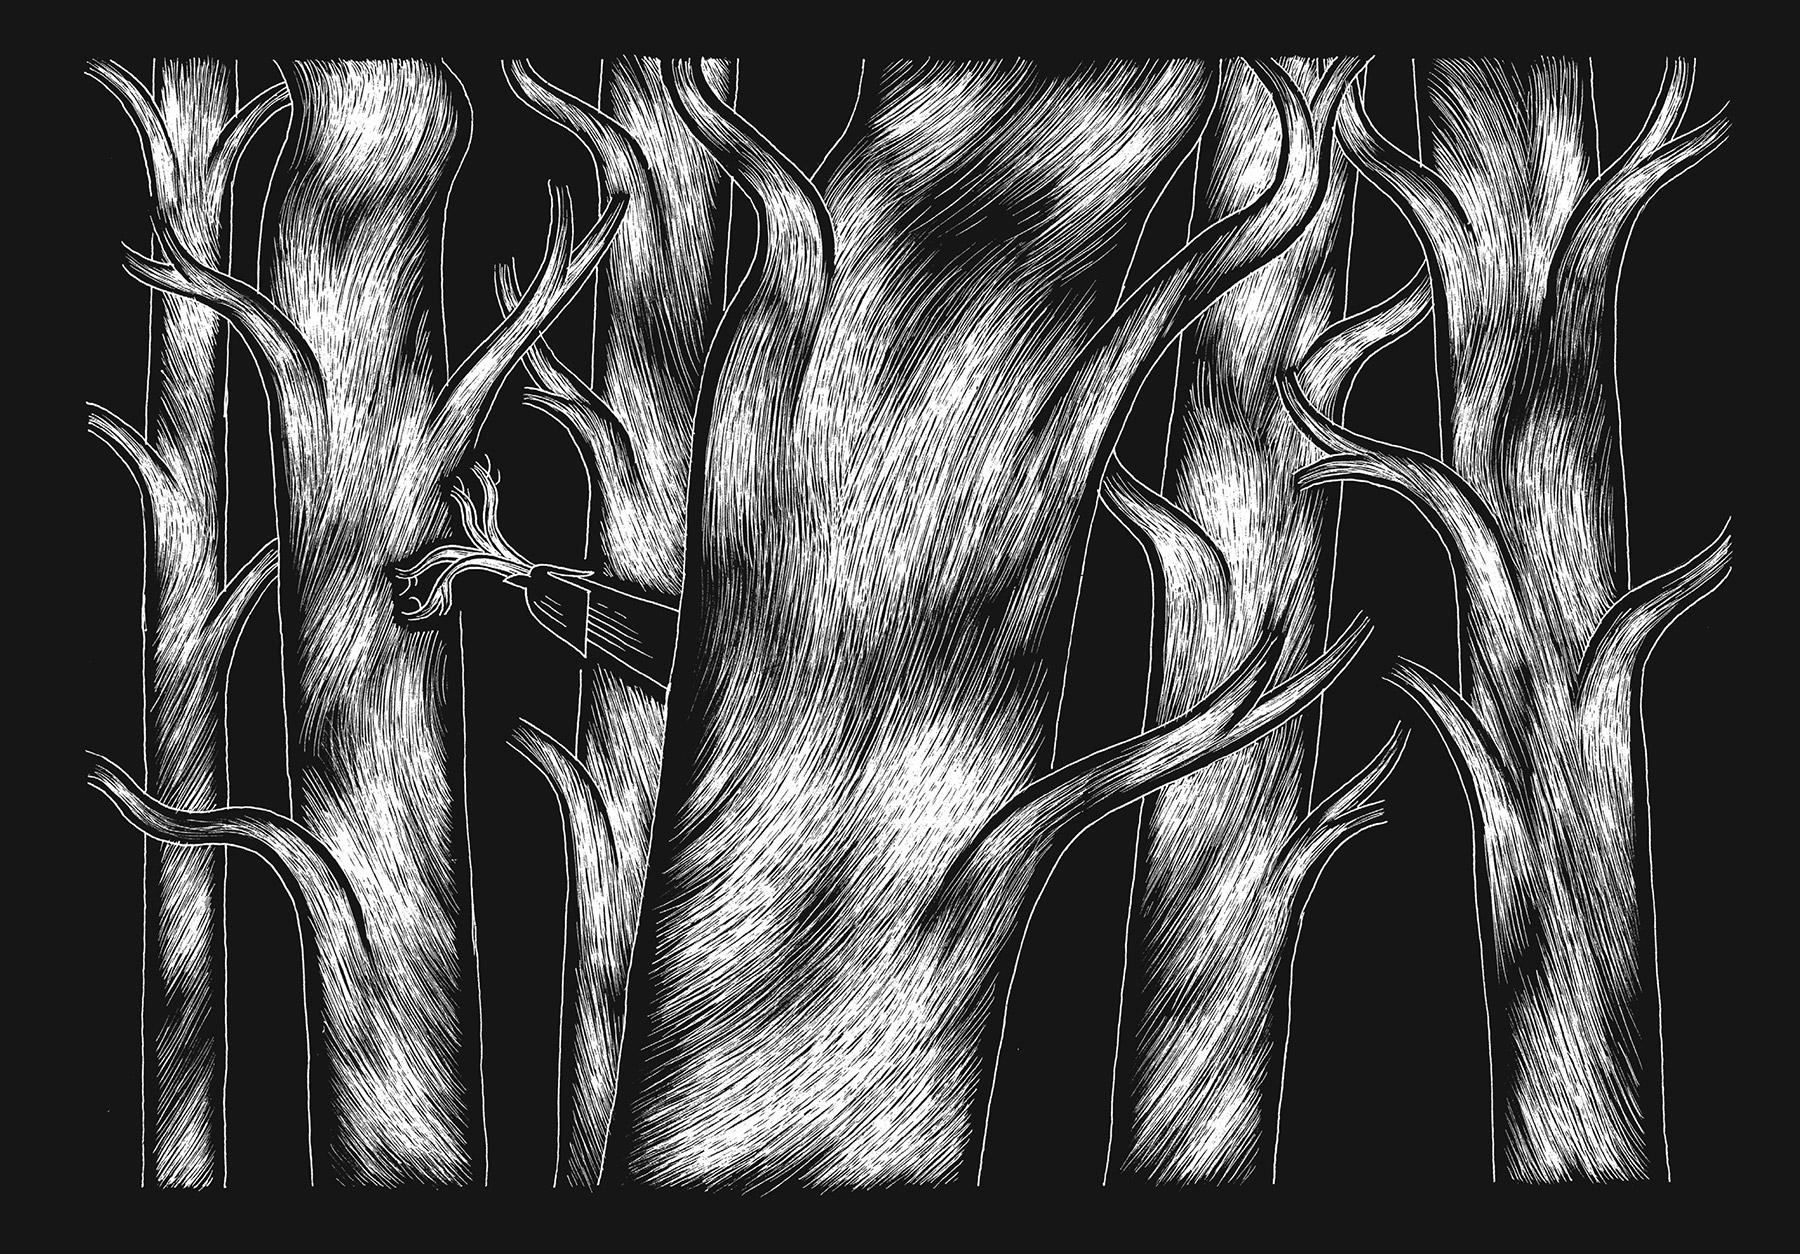 davidm-arboreal-web_expanded-7.jpg